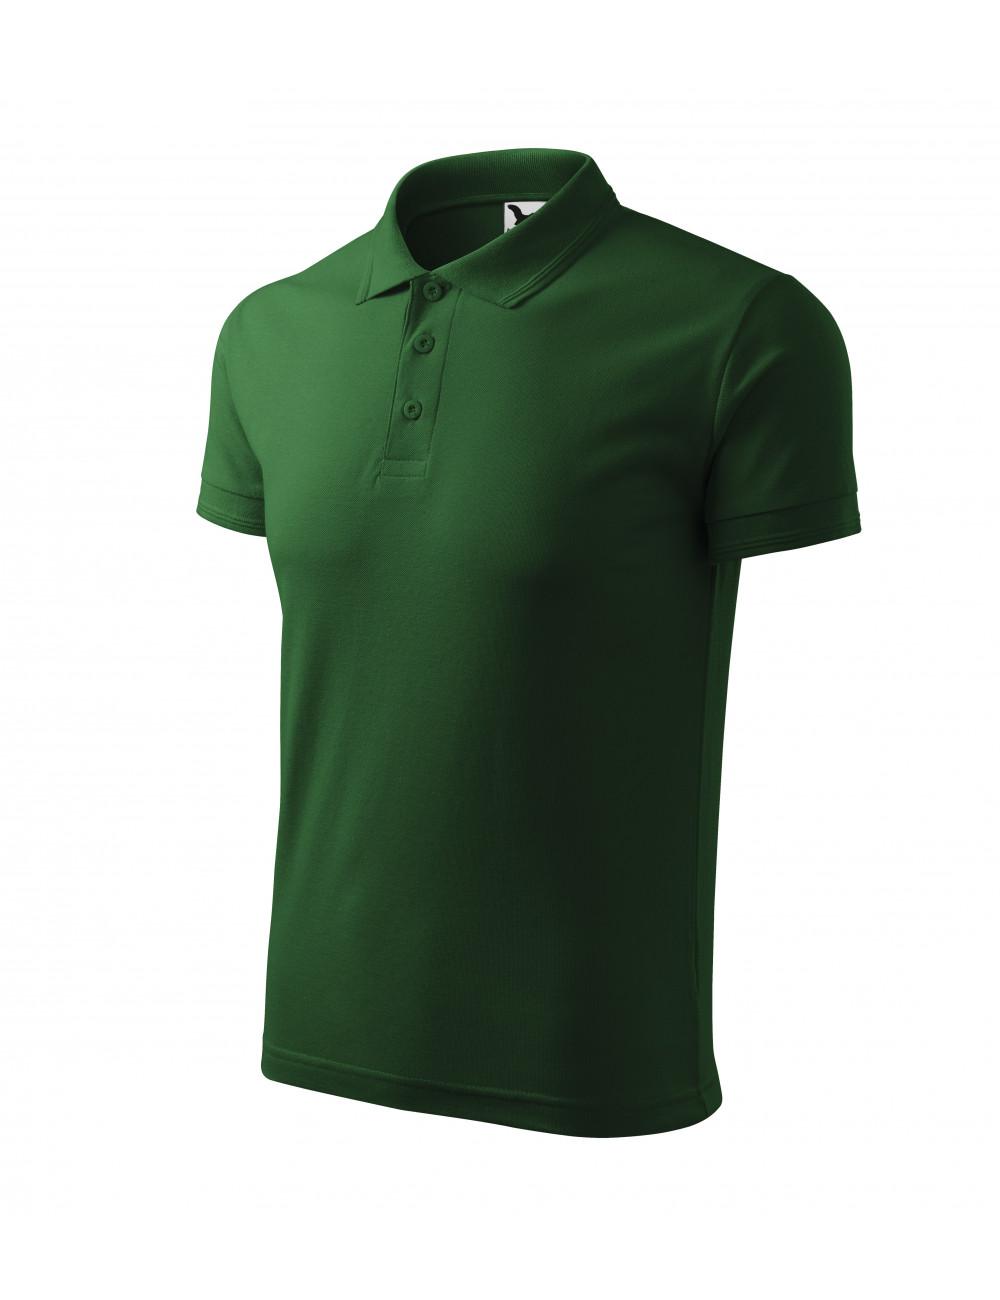 Adler MALFINI Koszulka polo męska Pique Polo 203 zieleń butelkowa